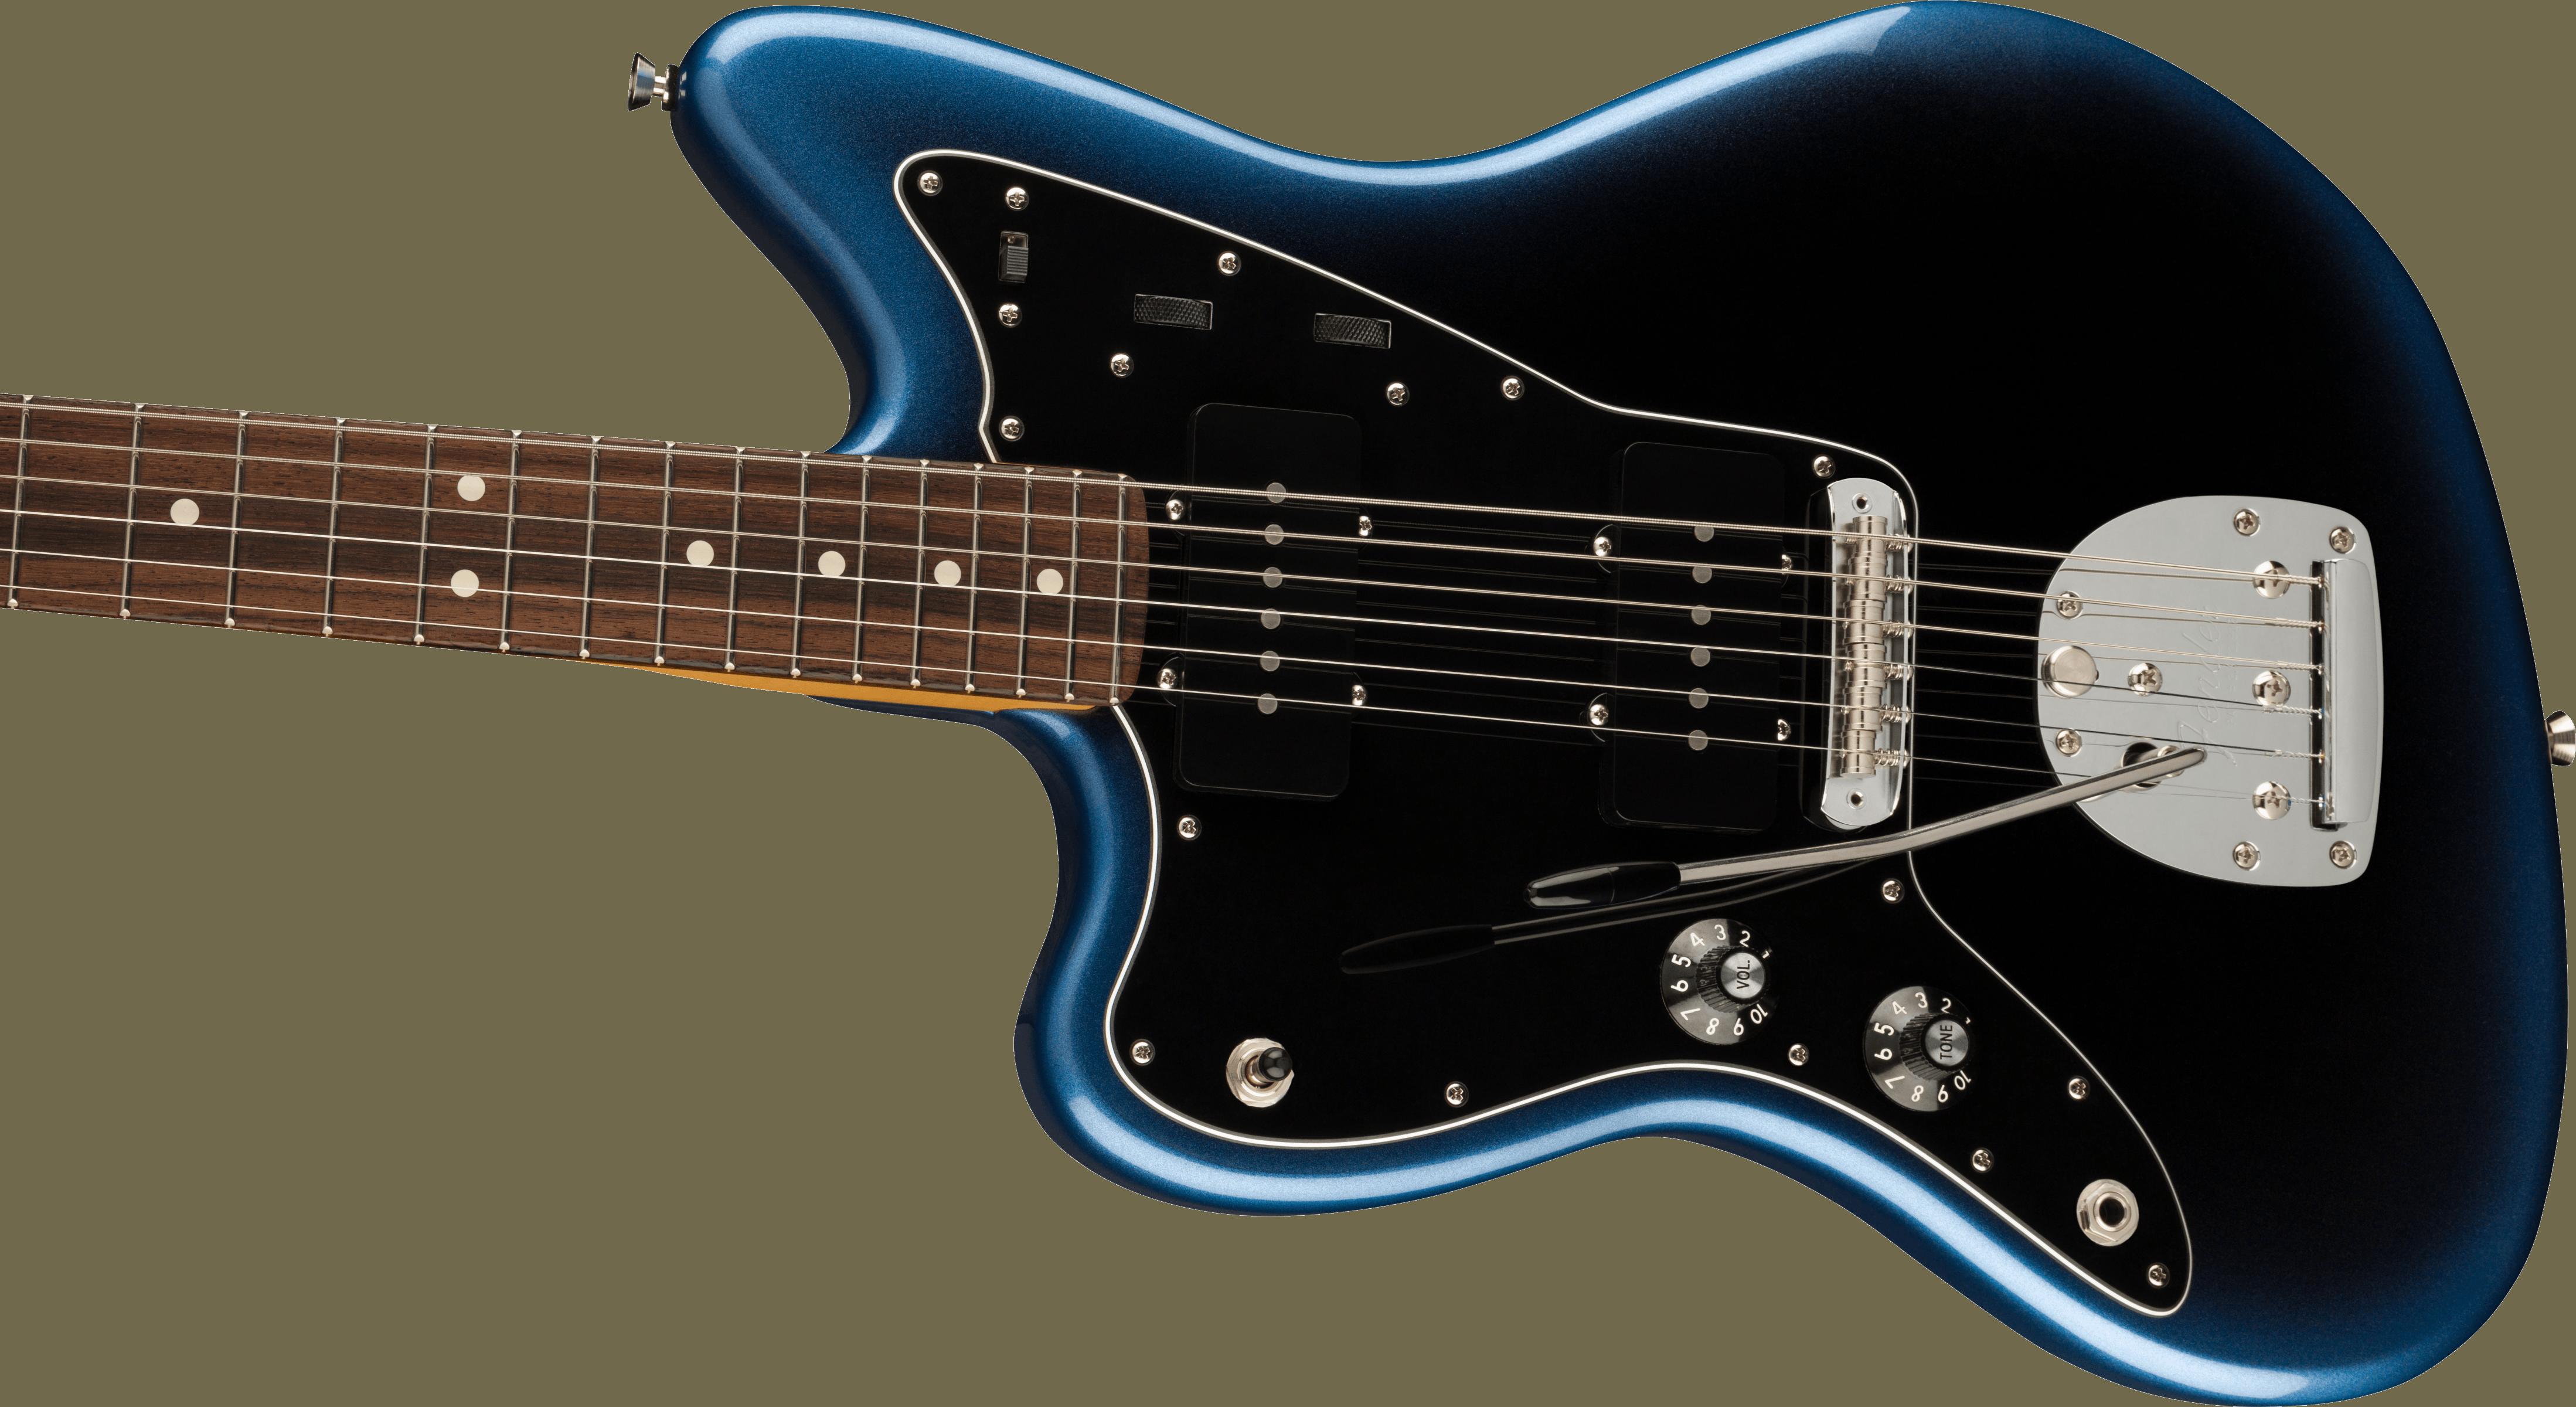 Fender American Professional II Jazzmaster® Left-Hand, Rosewood Fingerboard, Dark Night